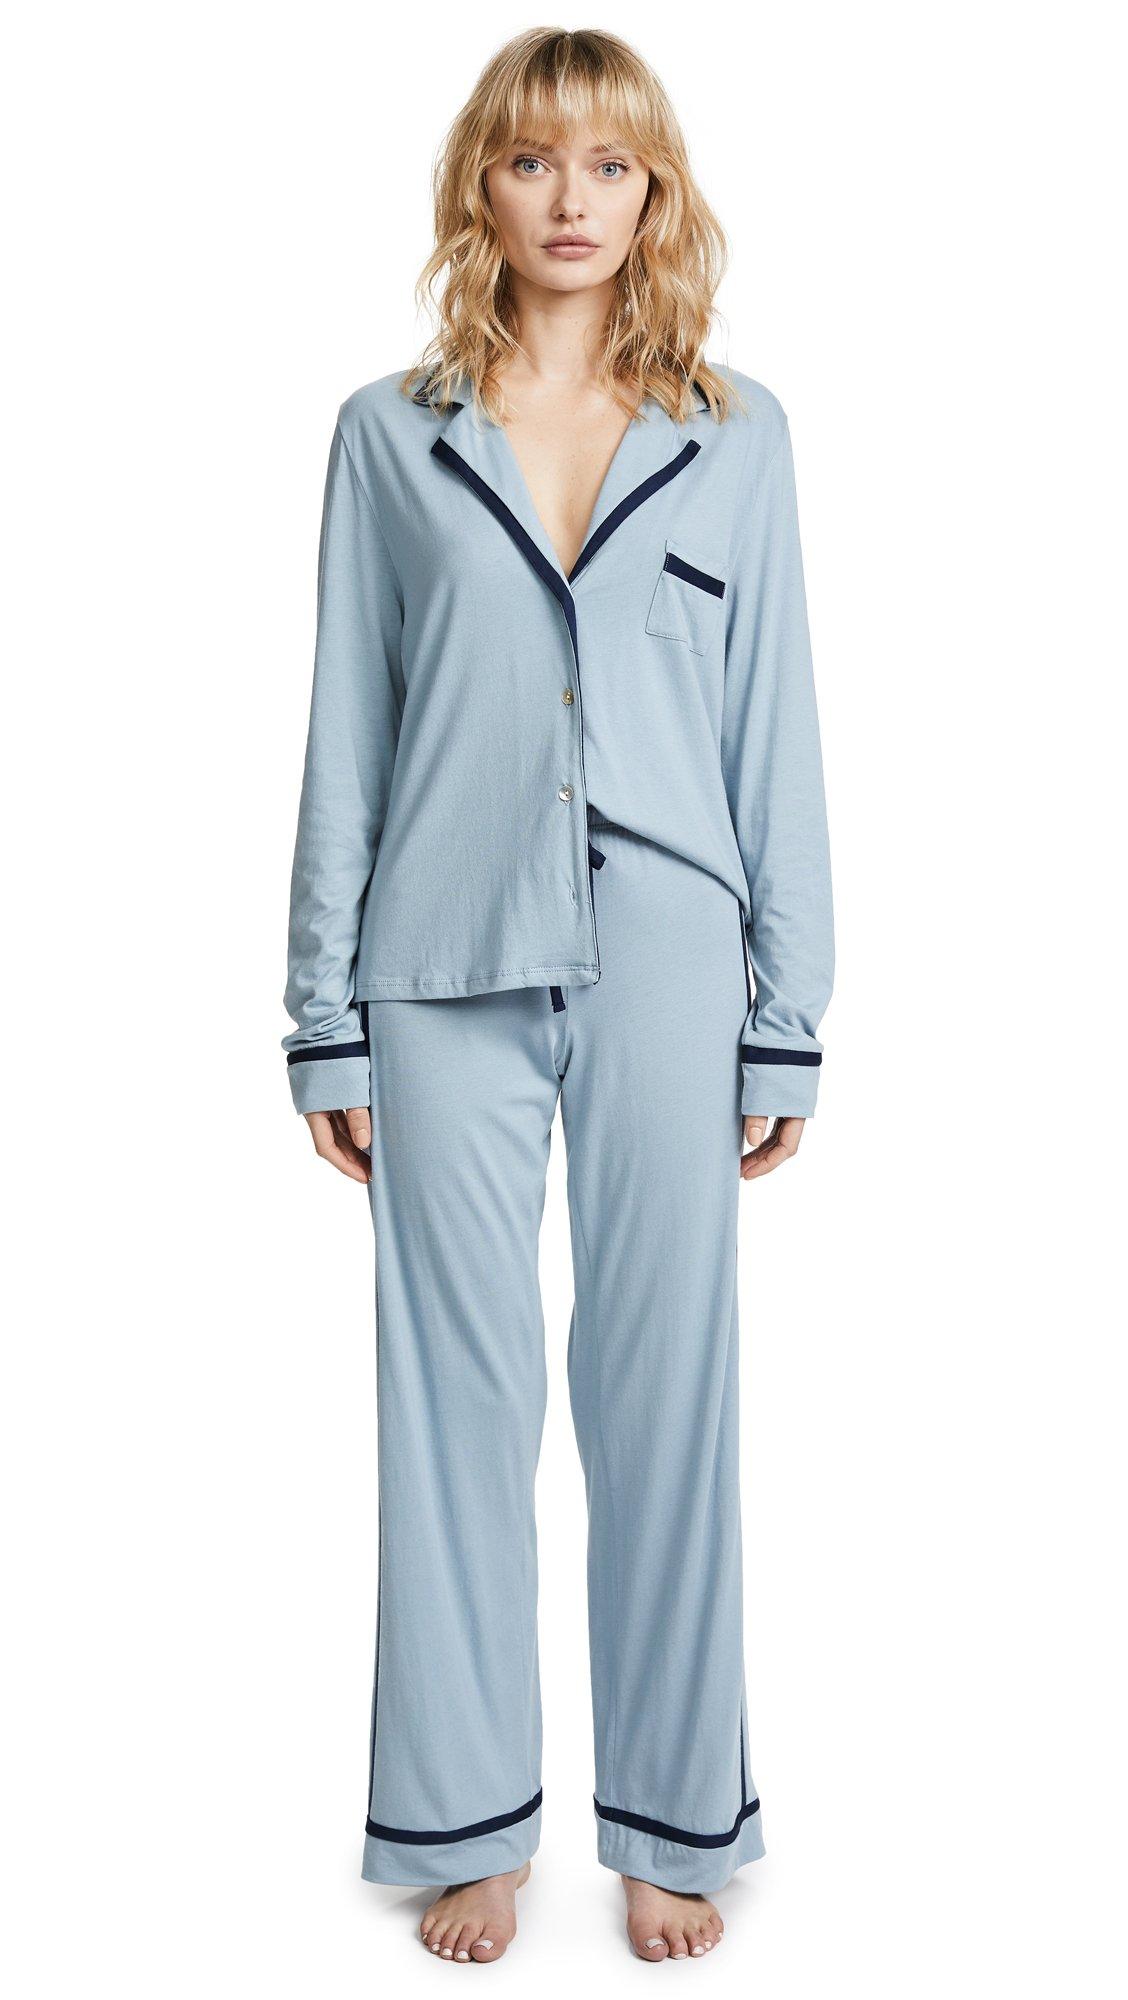 Cosabella Women's Amore9541, bathe Blue/Navy Blu, Medium